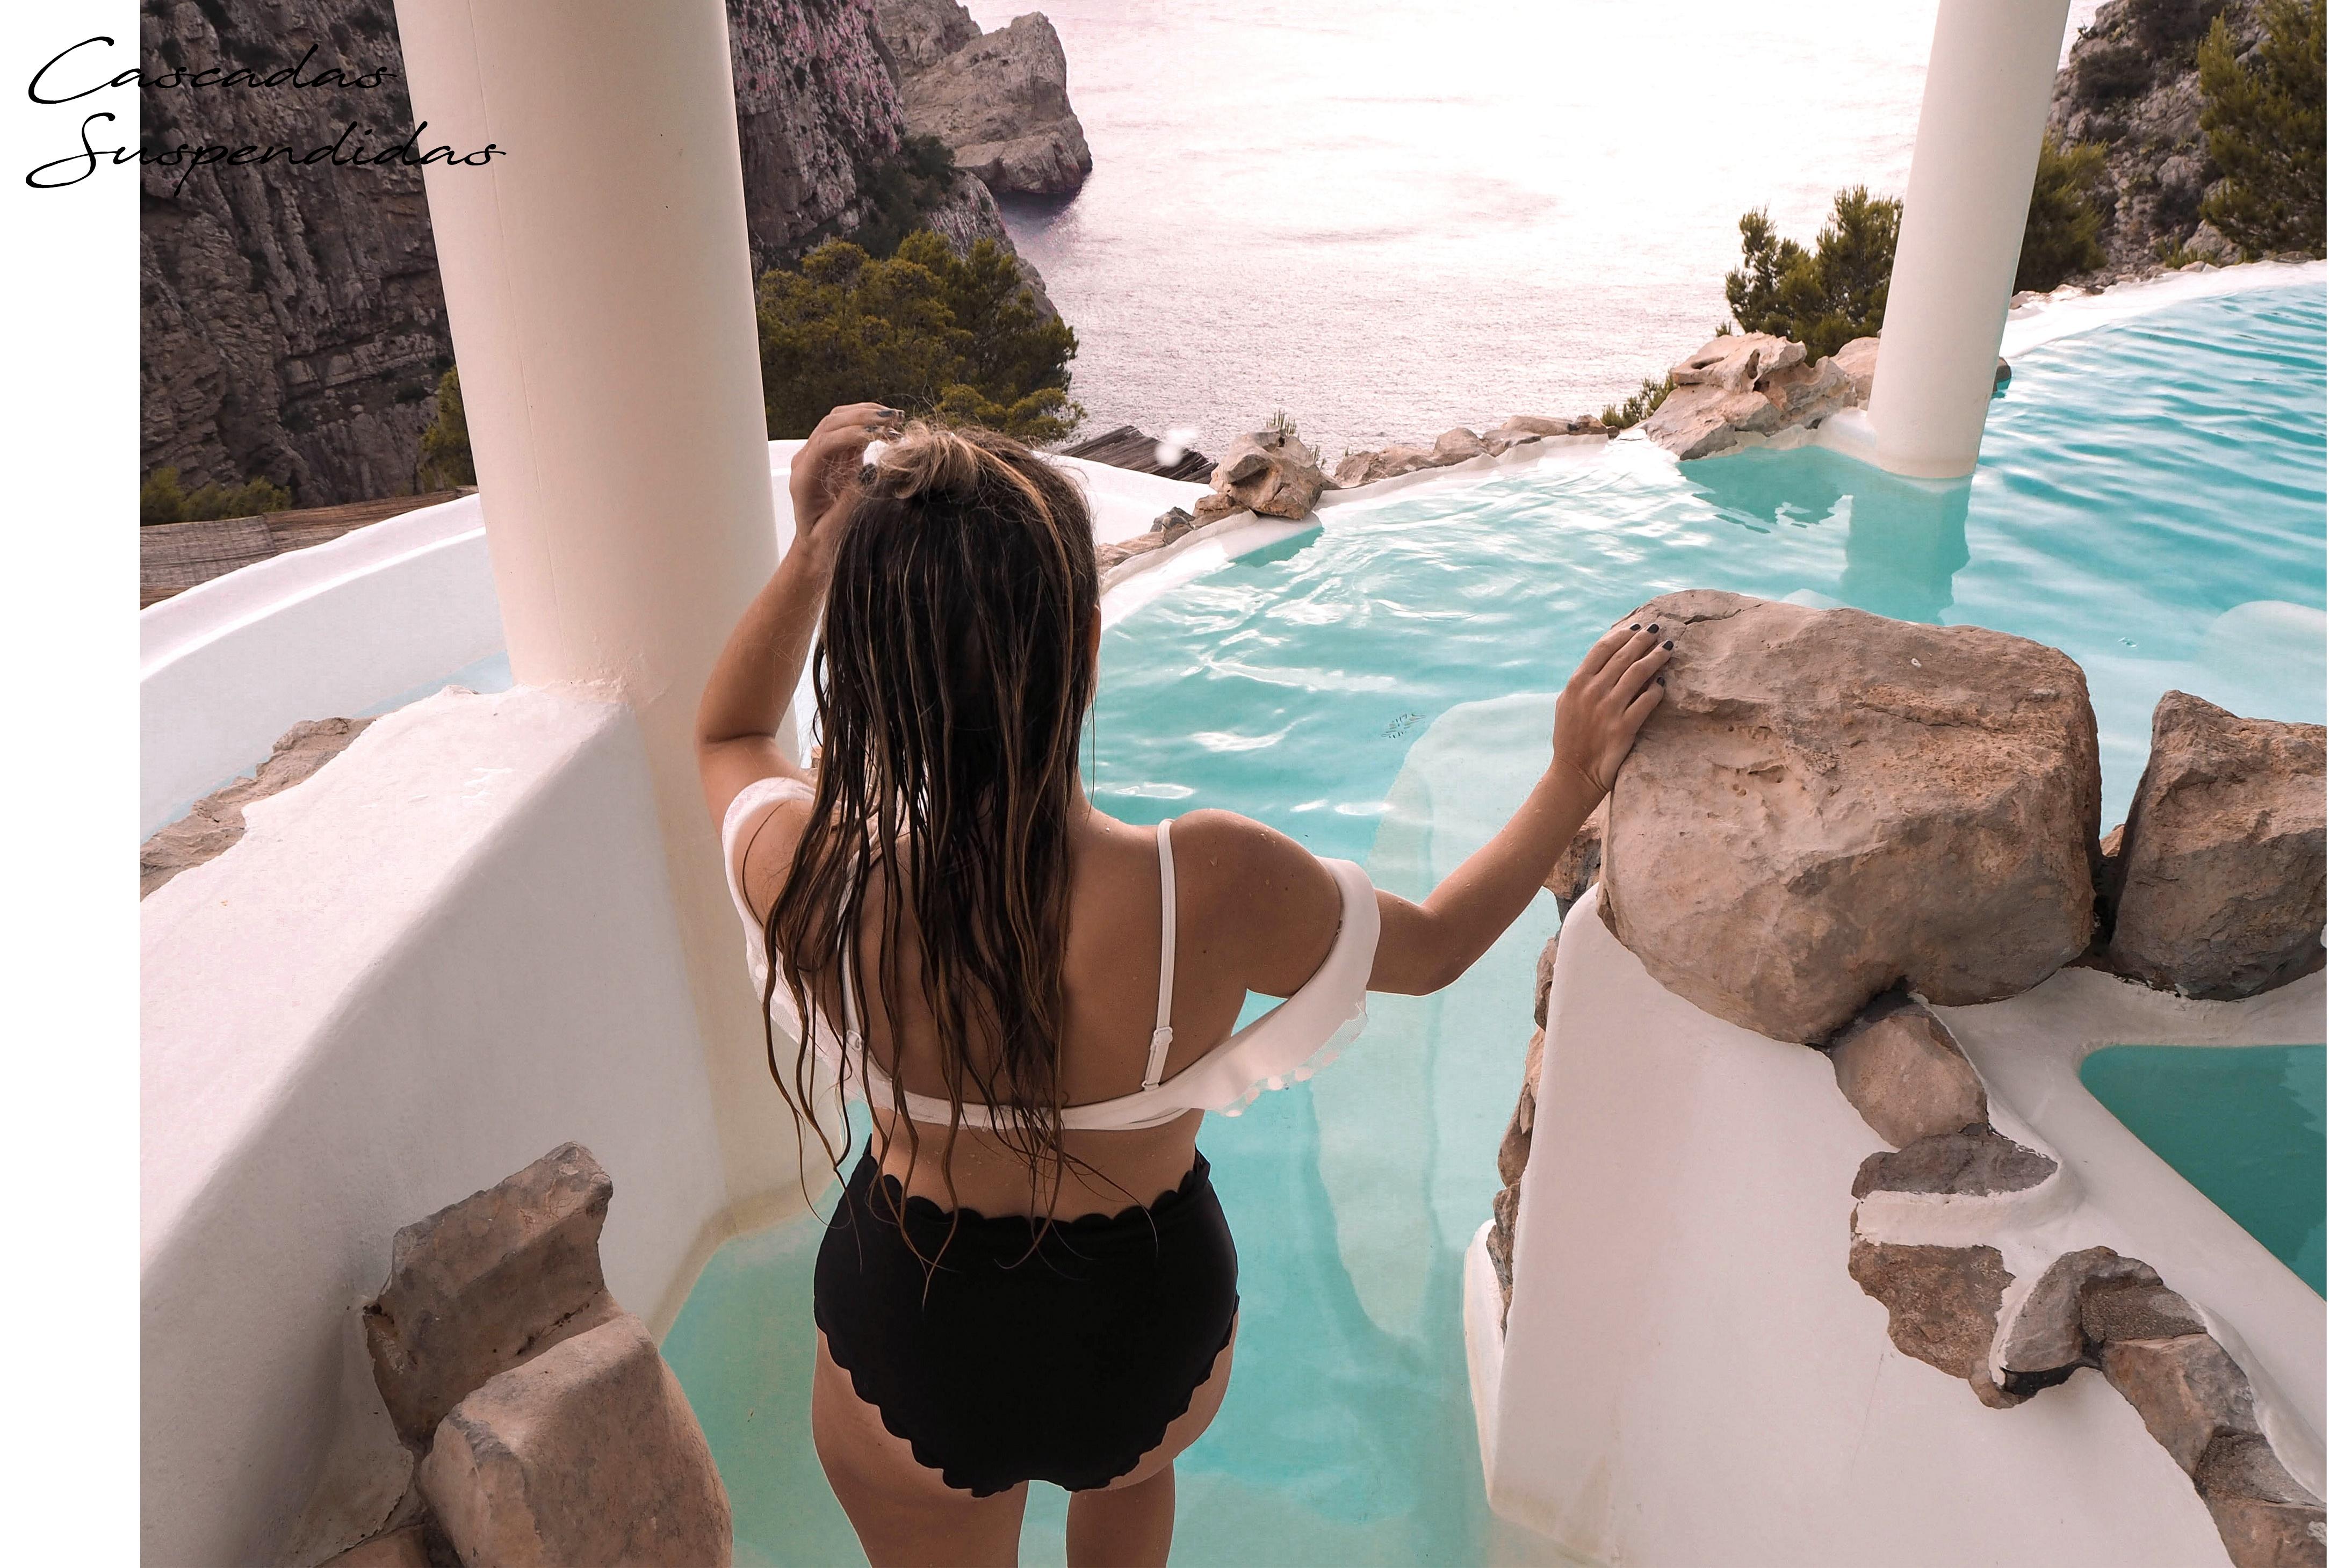 ibiza 2017 hacienda na xamena cascadas suspendidas pica pica experience review ibiza travel guide diary